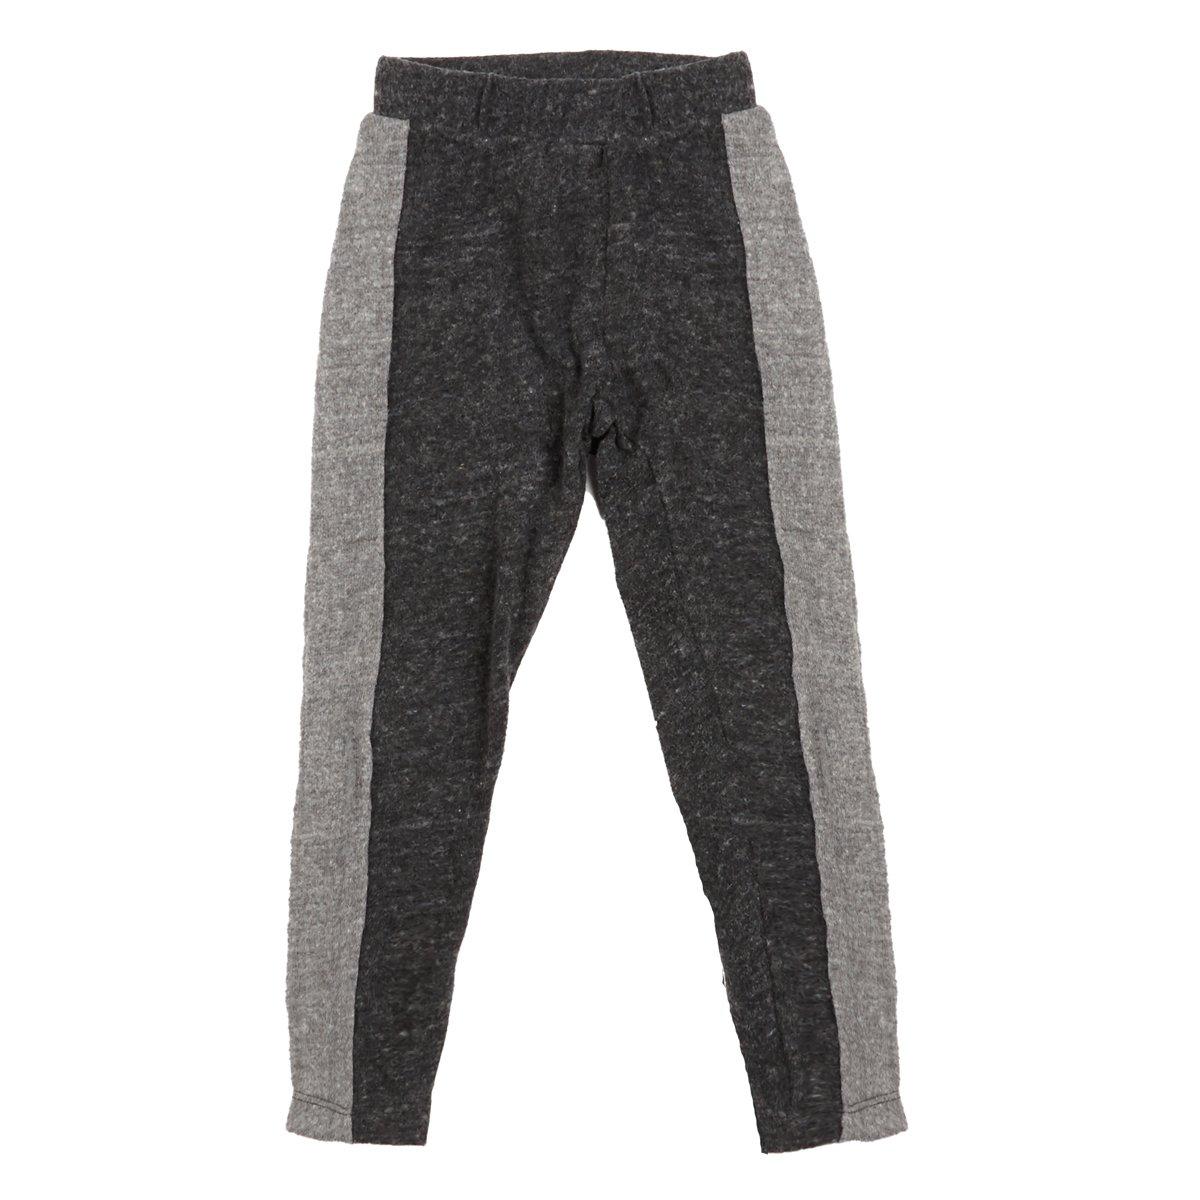 Joah Love Big Girls' Jones Charcoal Pant, 4